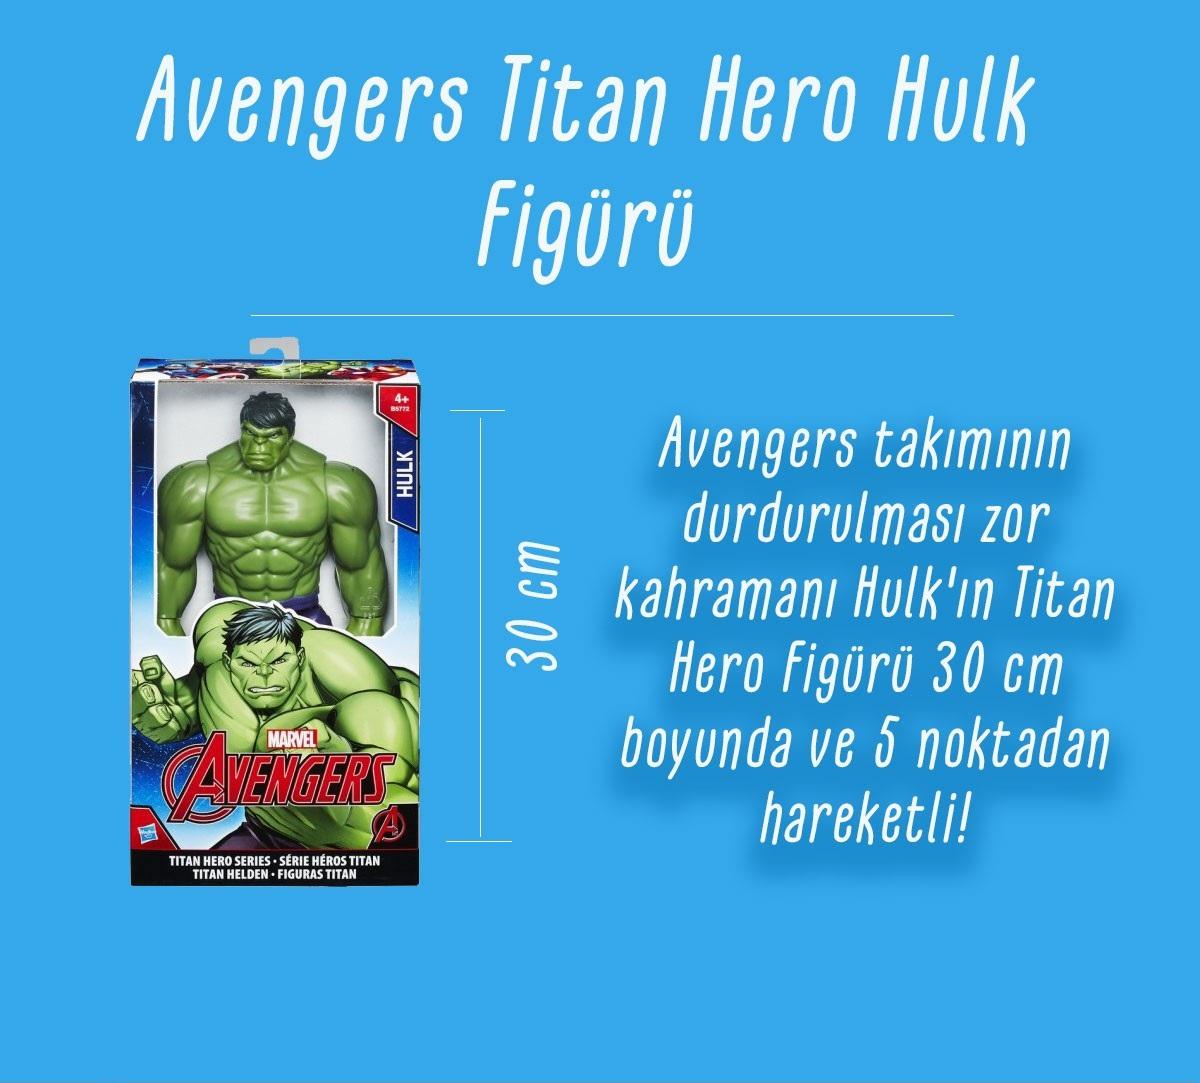 Avengers Titan Hero Hulk figürü